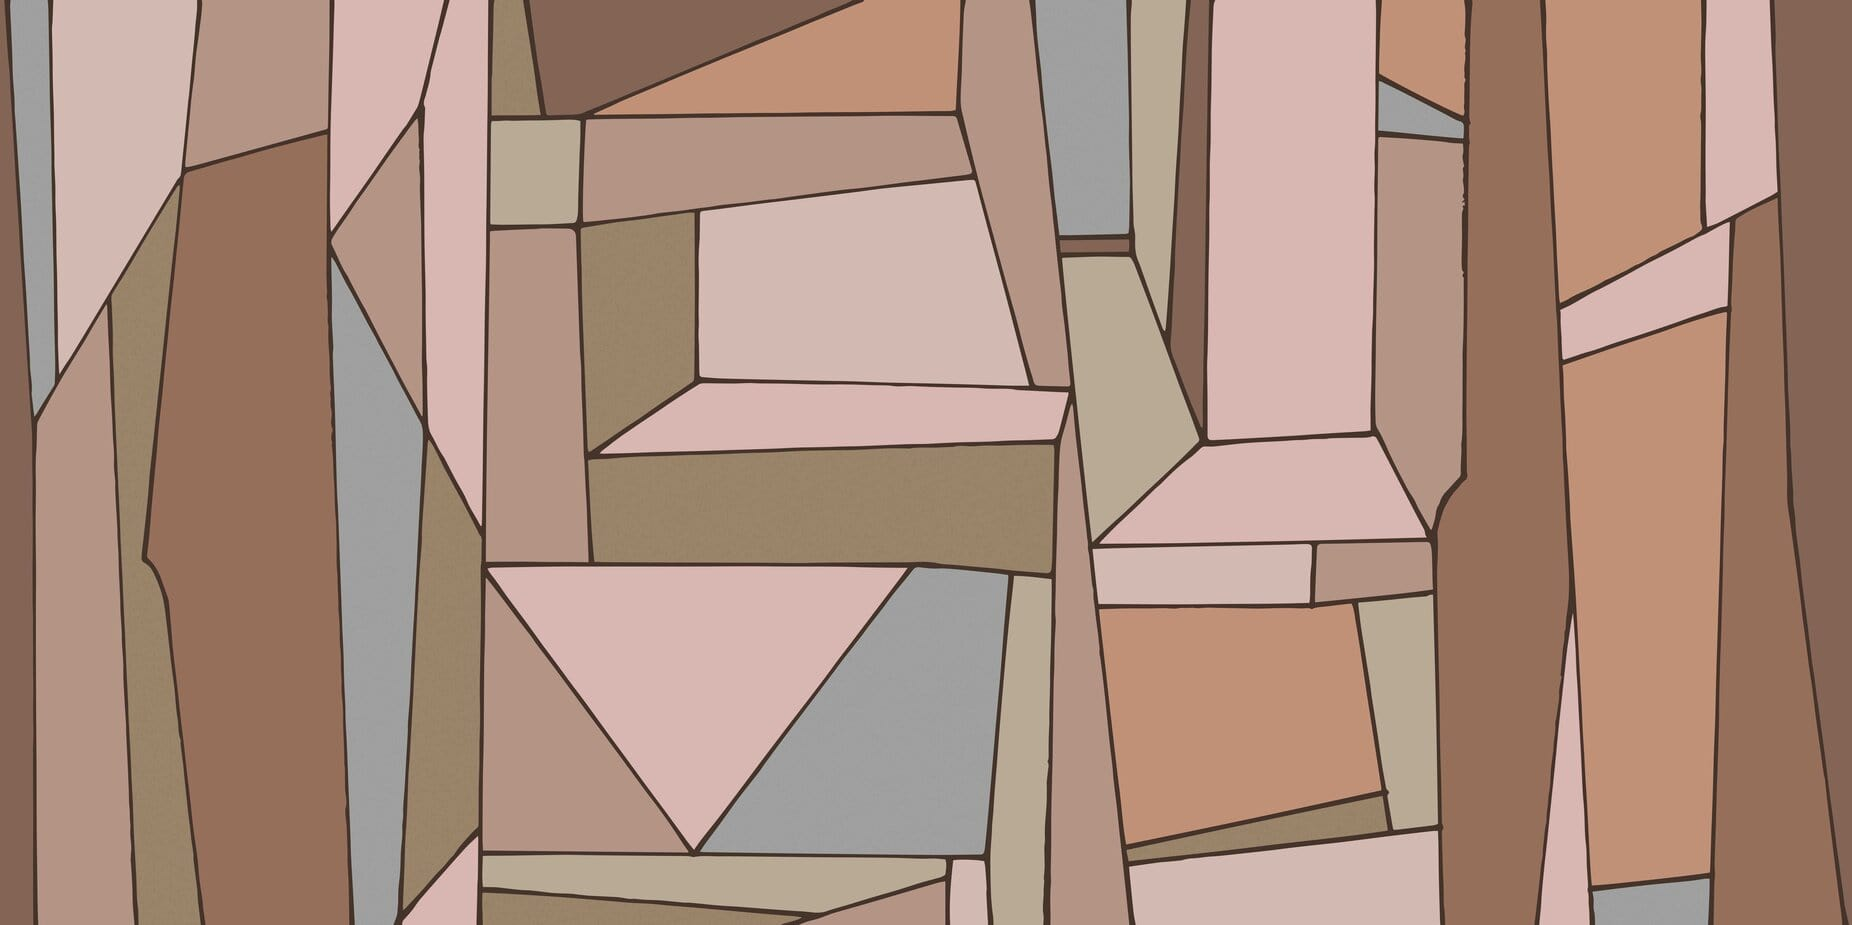 6 - Shapes